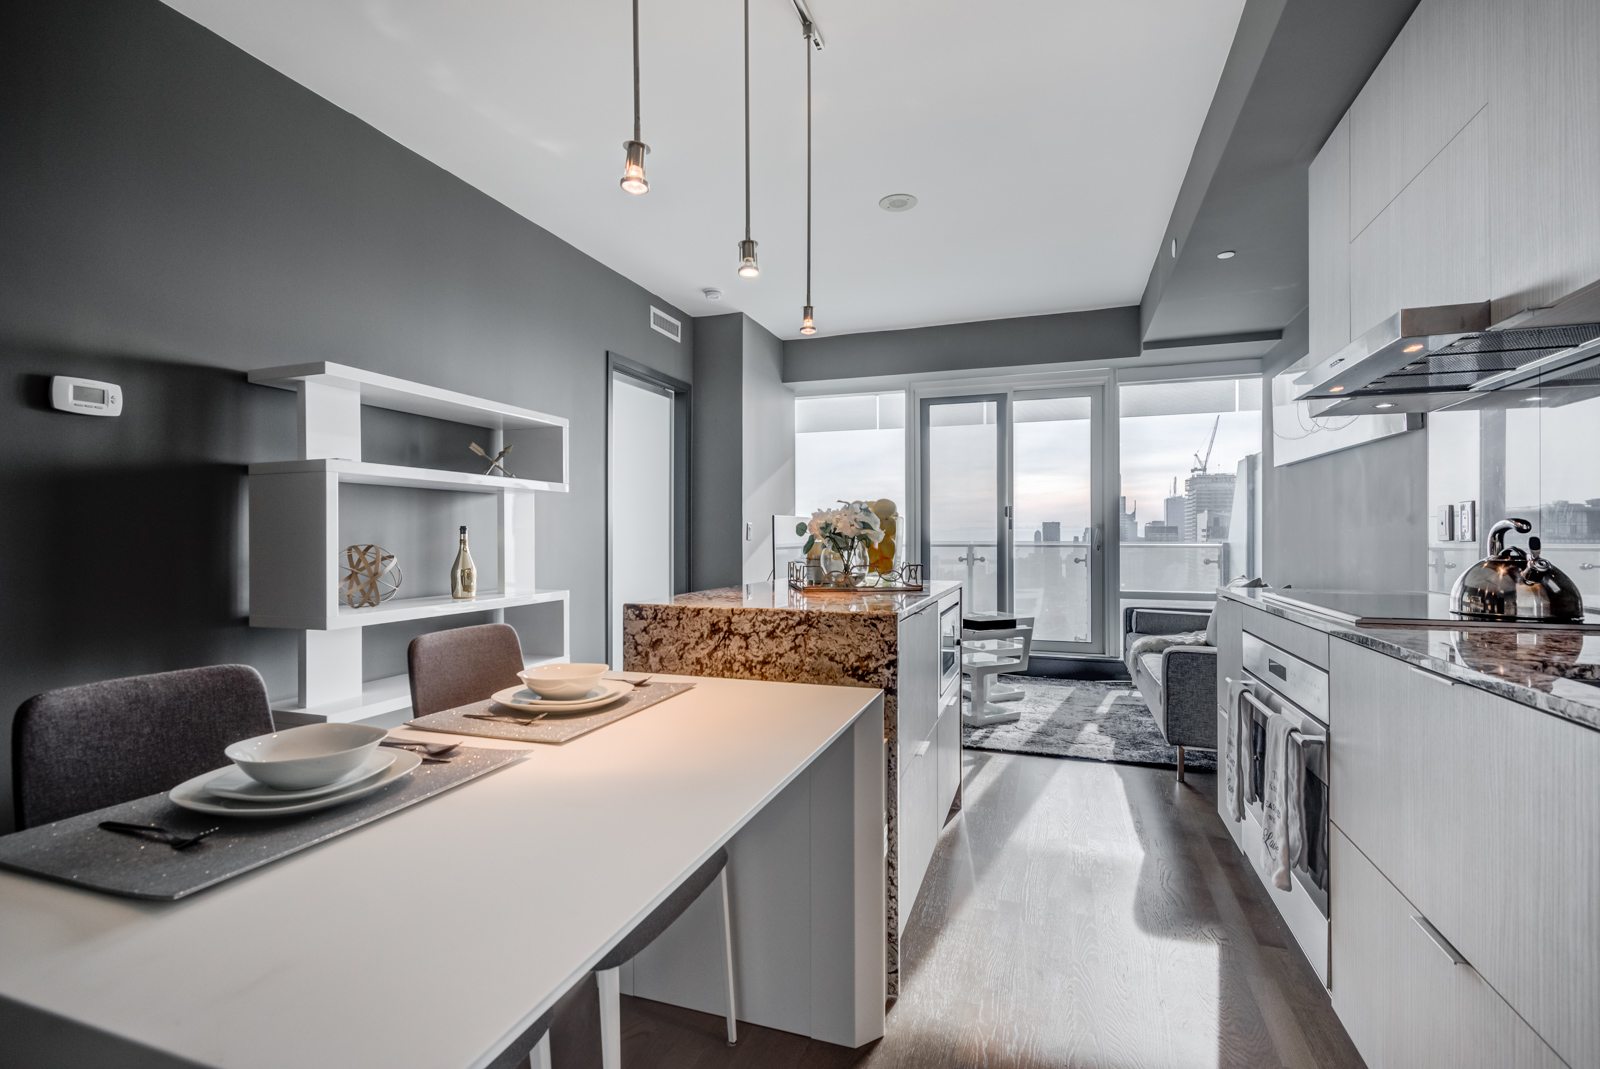 Condo kitchen with white island